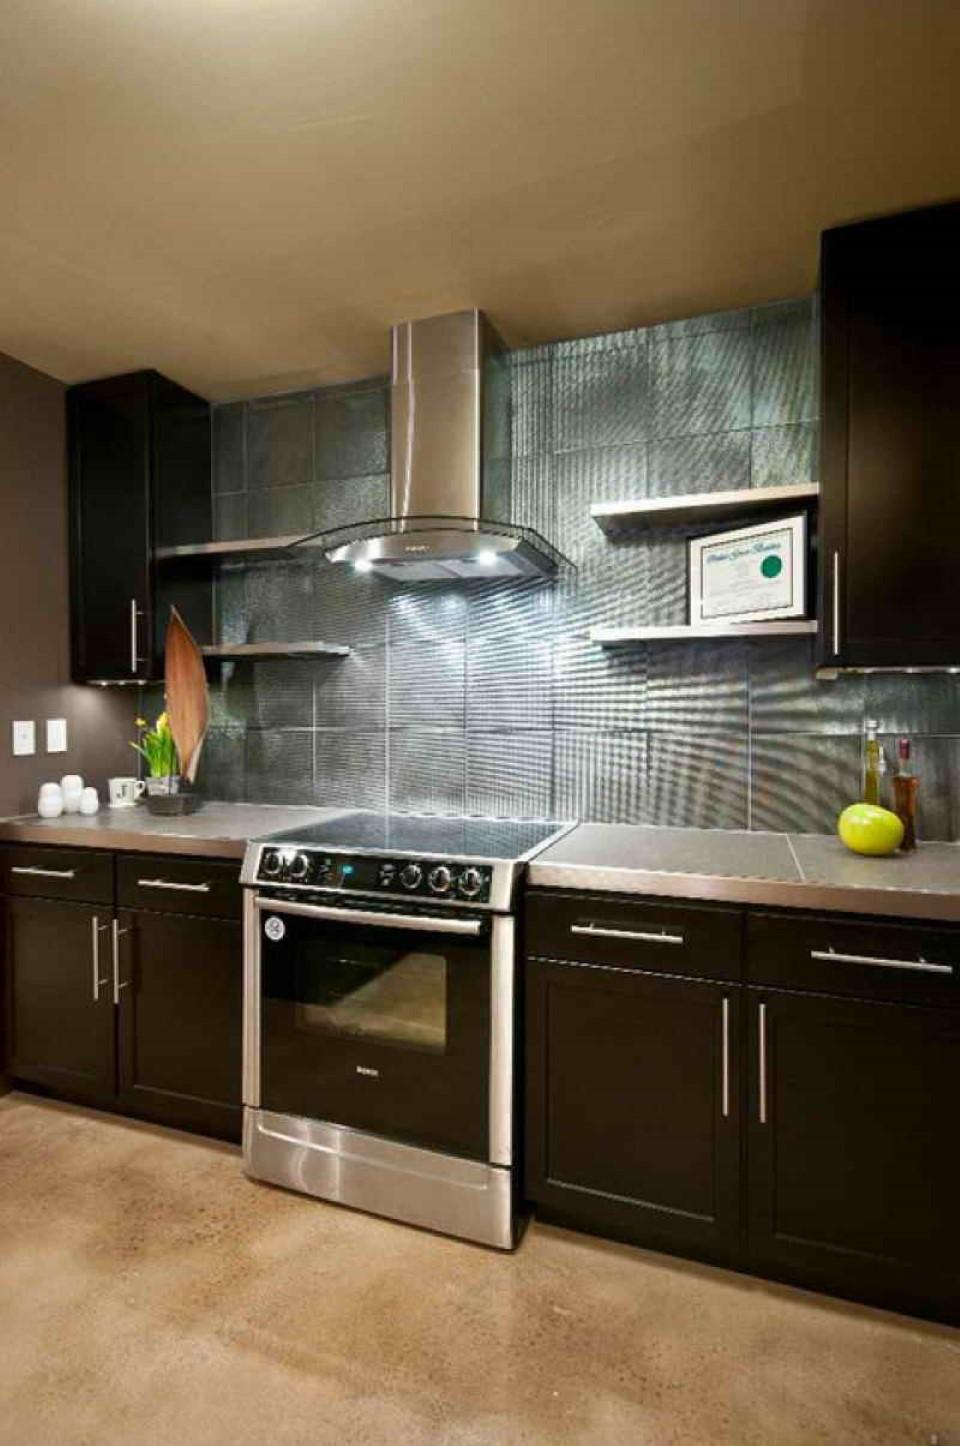 Homement Elegant Kitchen Ideas For on vintage kitchen ideas for 2015, small kitchen ideas for 2015, hot kitchen ideas for 2015,